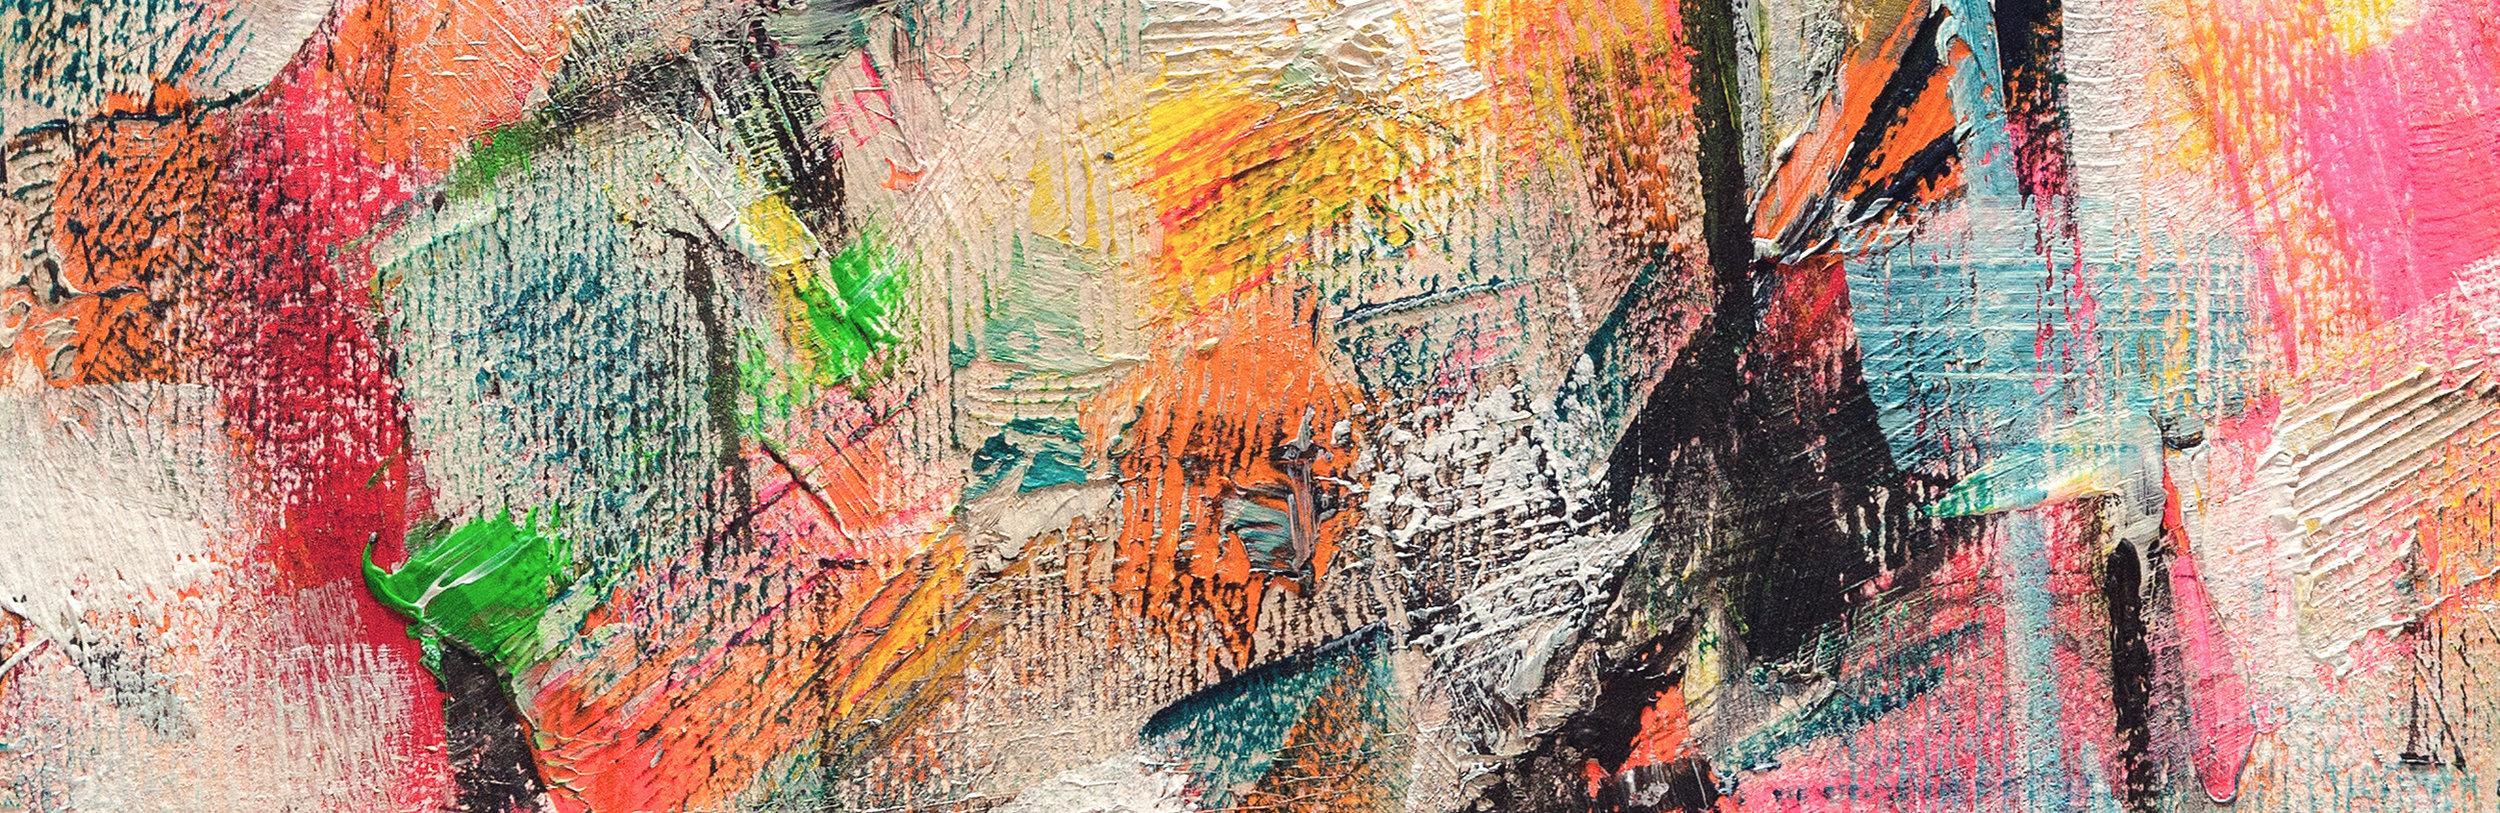 bonjourmolotov+Liquid+sunshine+Illustration+Ilustracao+painting+pintura+acrylic+acrílico+canvas+tela+paper+cardboard+mdf+Andre+Gigante+03N.jpg